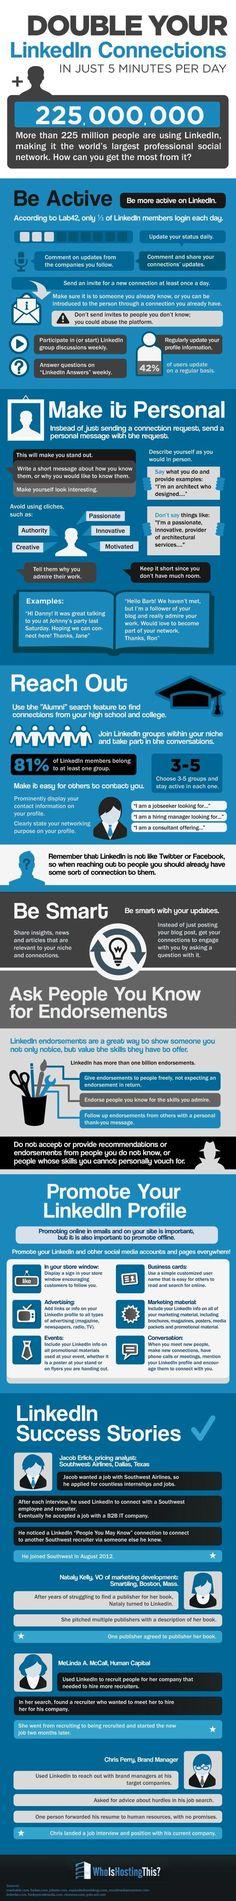 Q8Social (q8social) on Pinterest - find resumes on linkedin